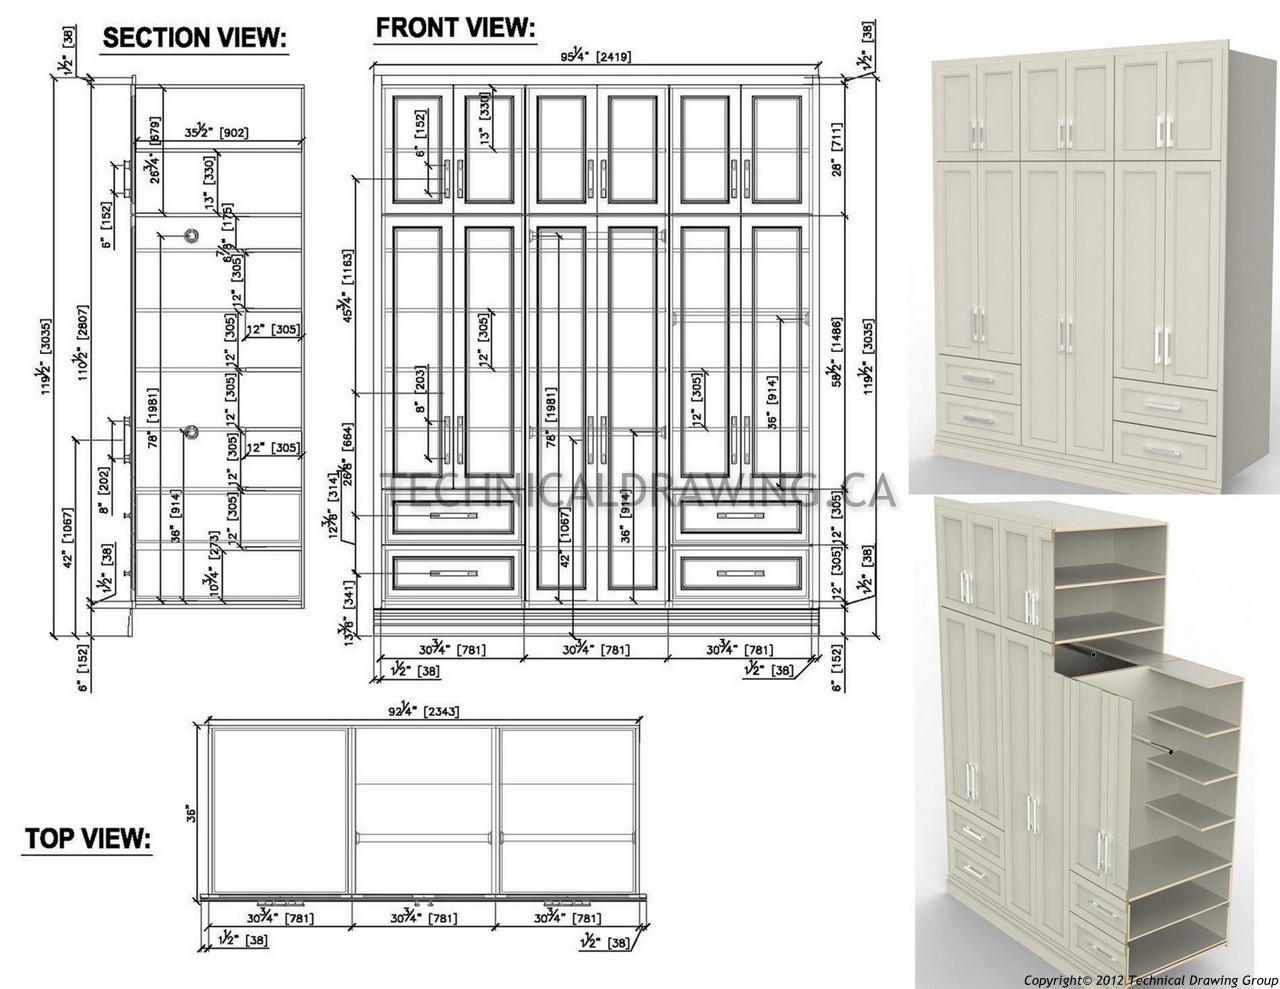 Cadkitchenplans com millwork shop drawings cabinet shop drawings - Millwork Shop Drawings Gta